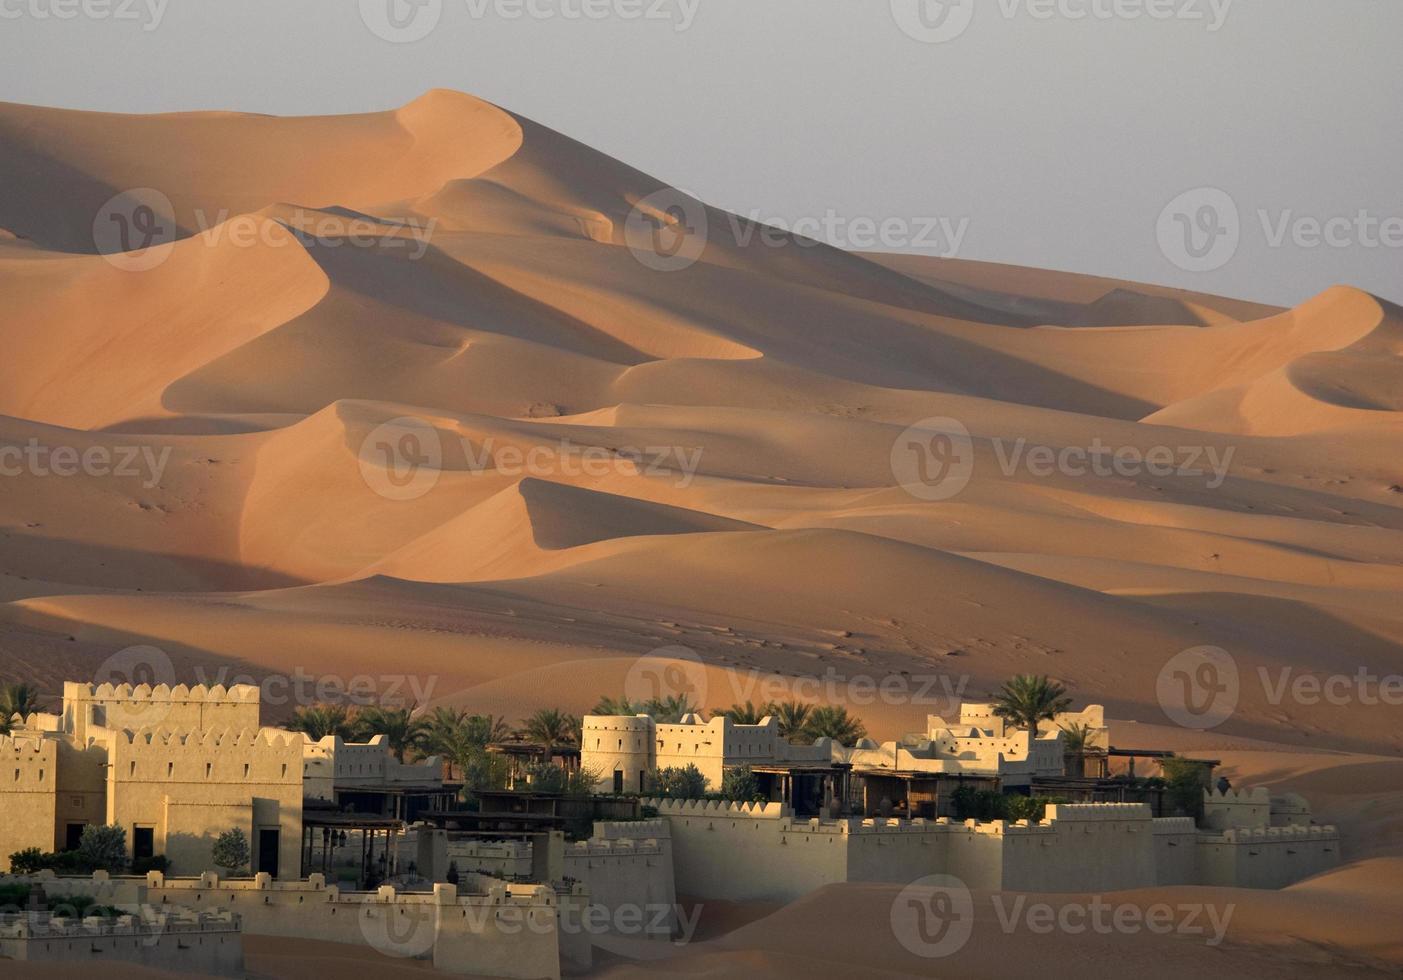 woestijn zandduin foto